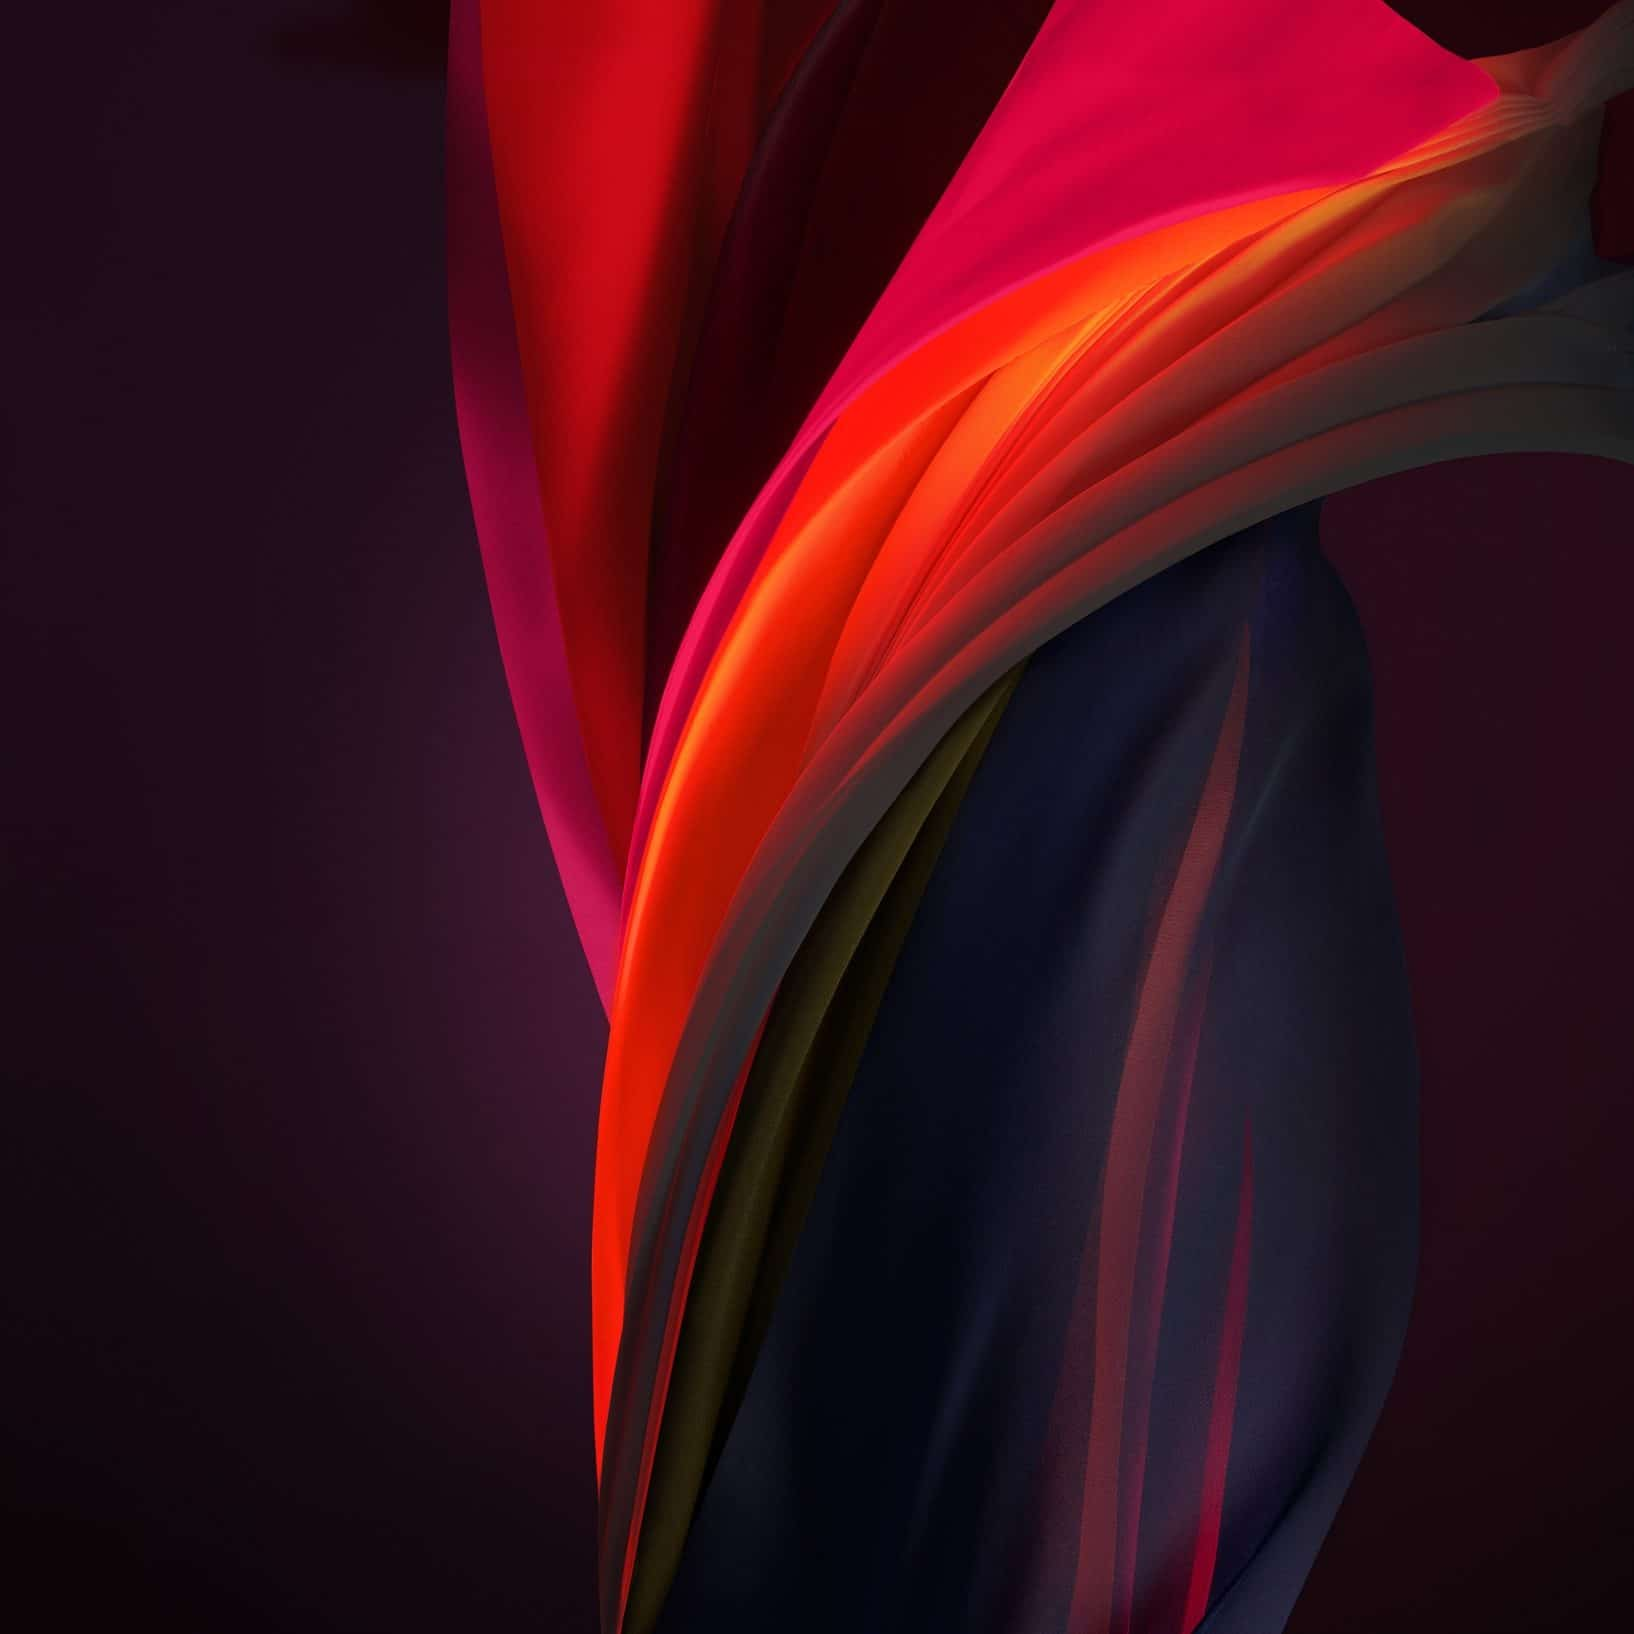 Silk Red Mono Dark iPhone SE 2 Wallpaper